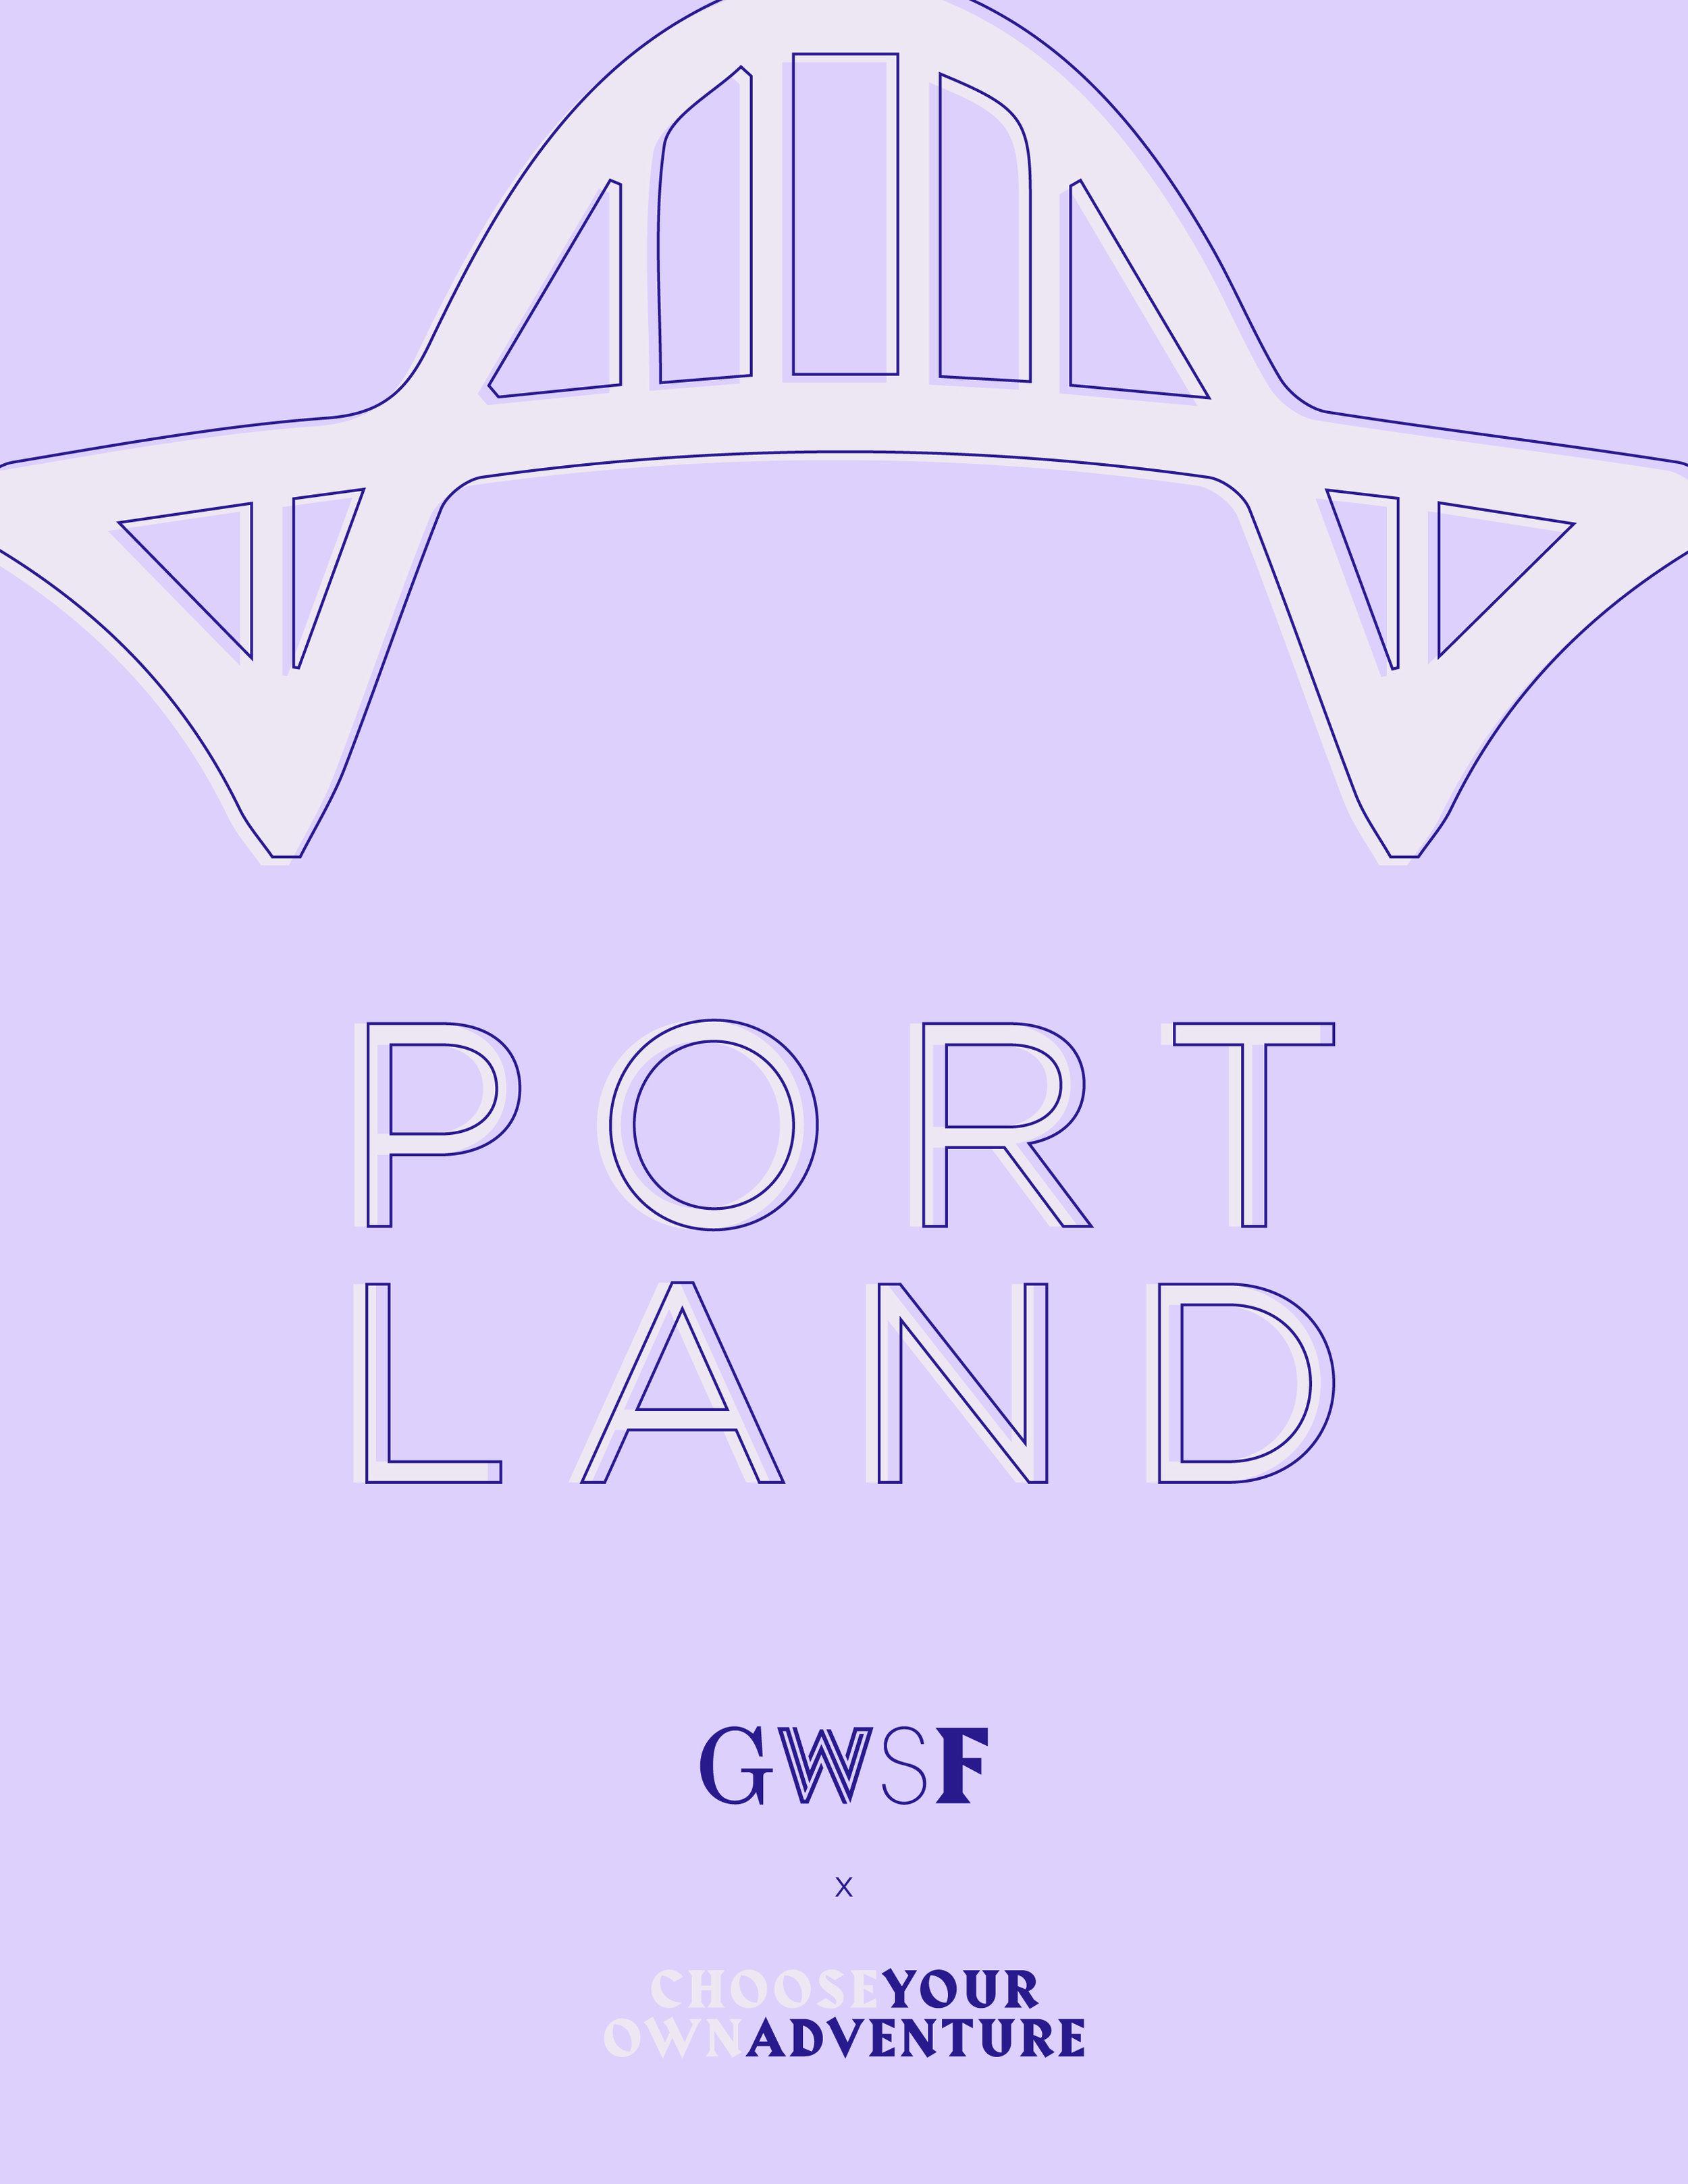 gwsf_itinerary_portland_link_title-01.jpg